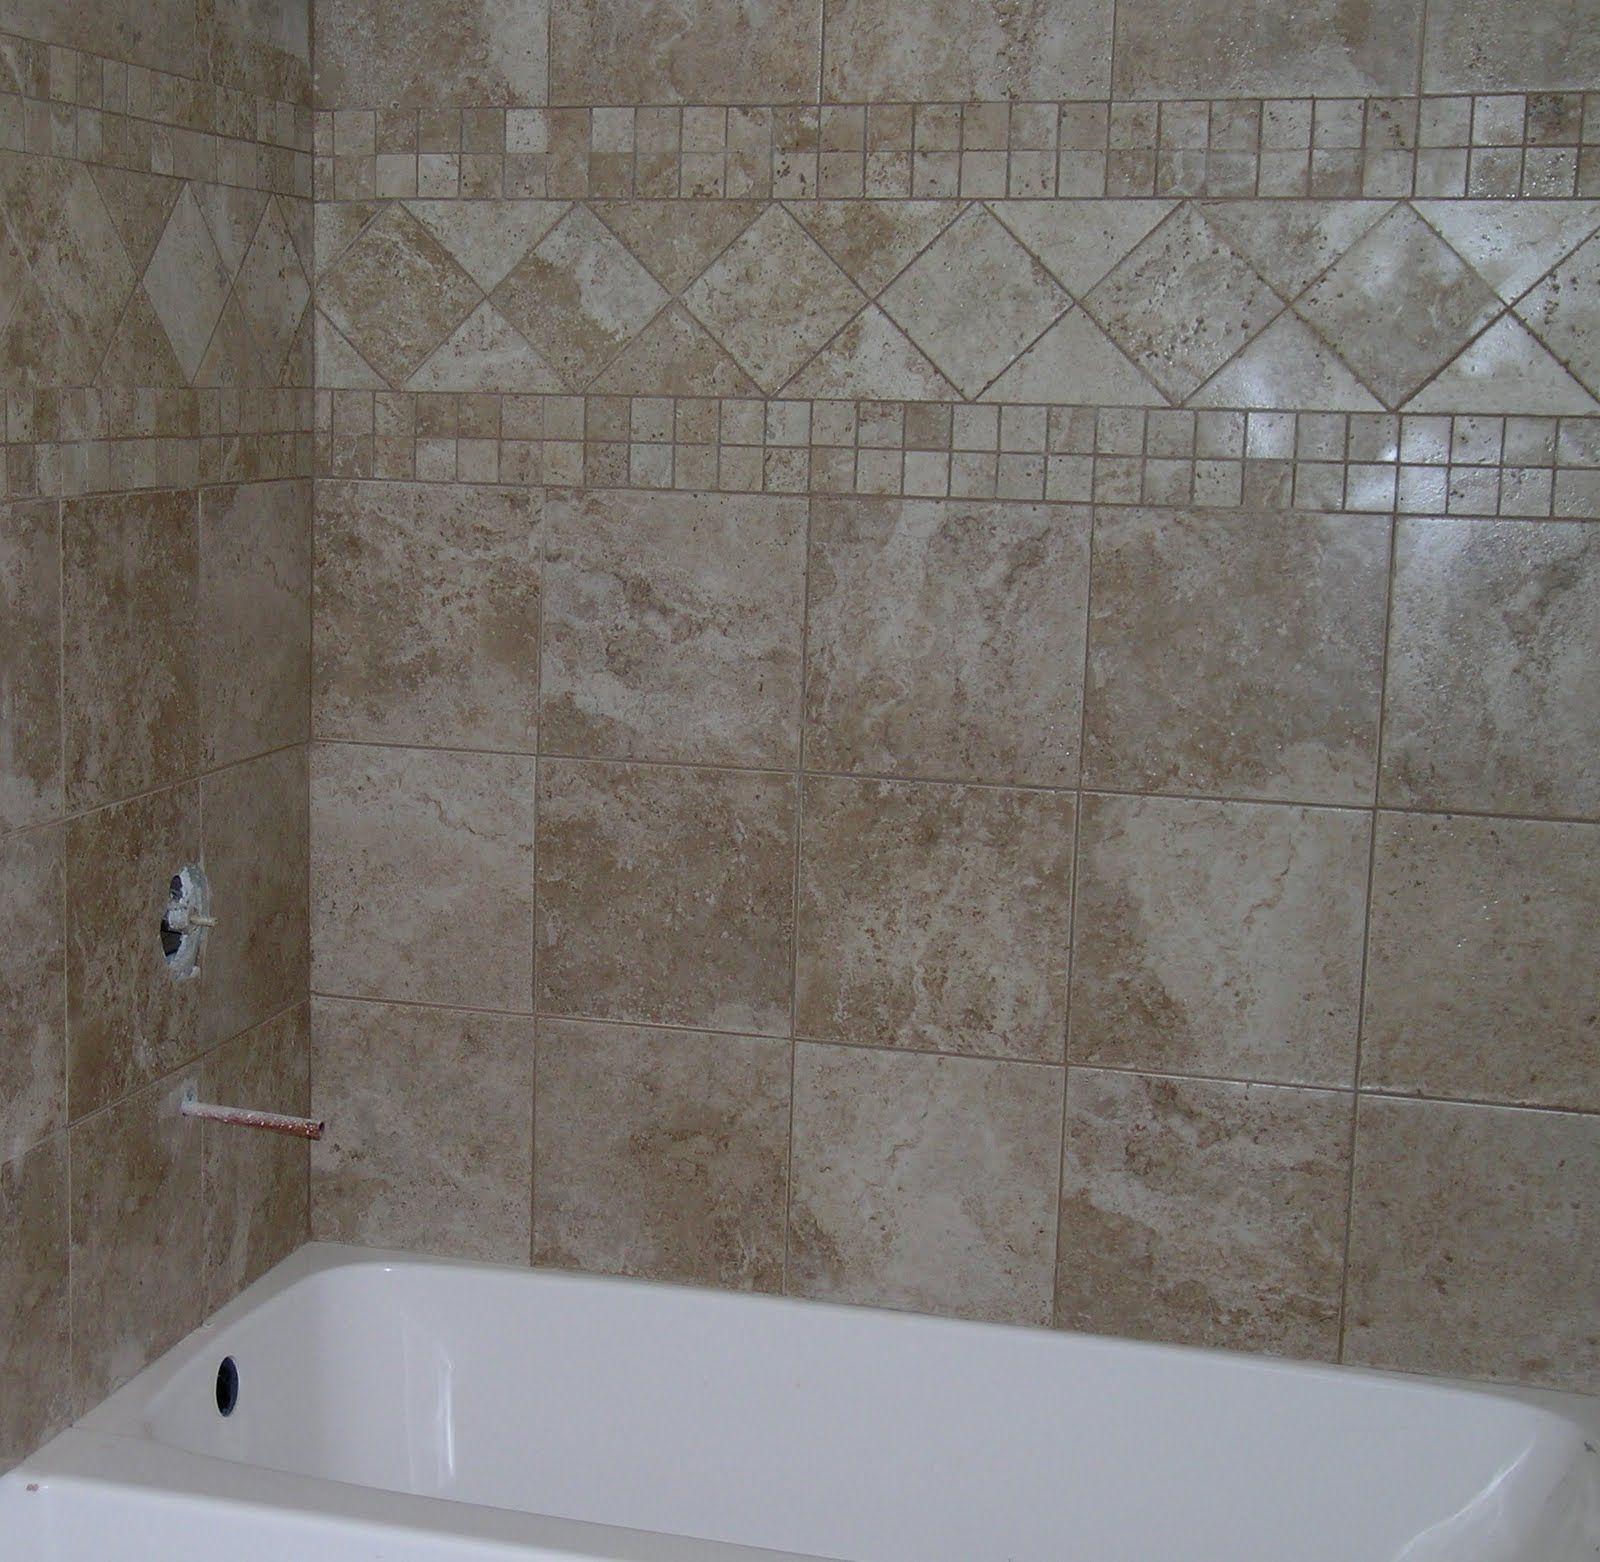 Extraordinary Home Depot Bathroom Supplies Ideas Simple Design